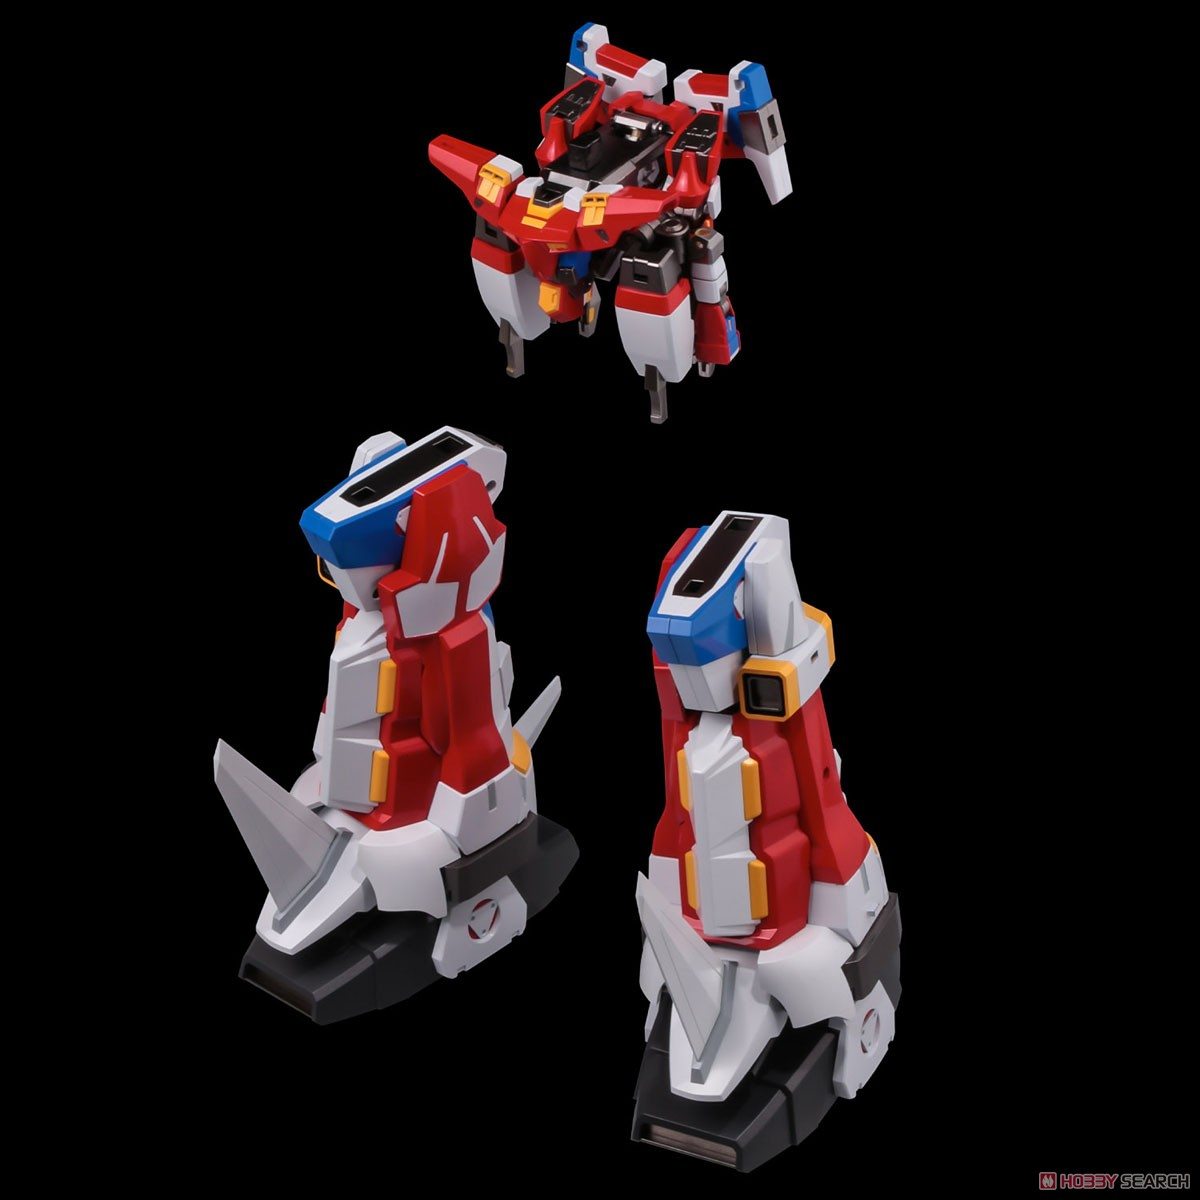 RIOBOT『変形合体 R-1』スーパーロボット大戦OG 可変合体フィギュア-038